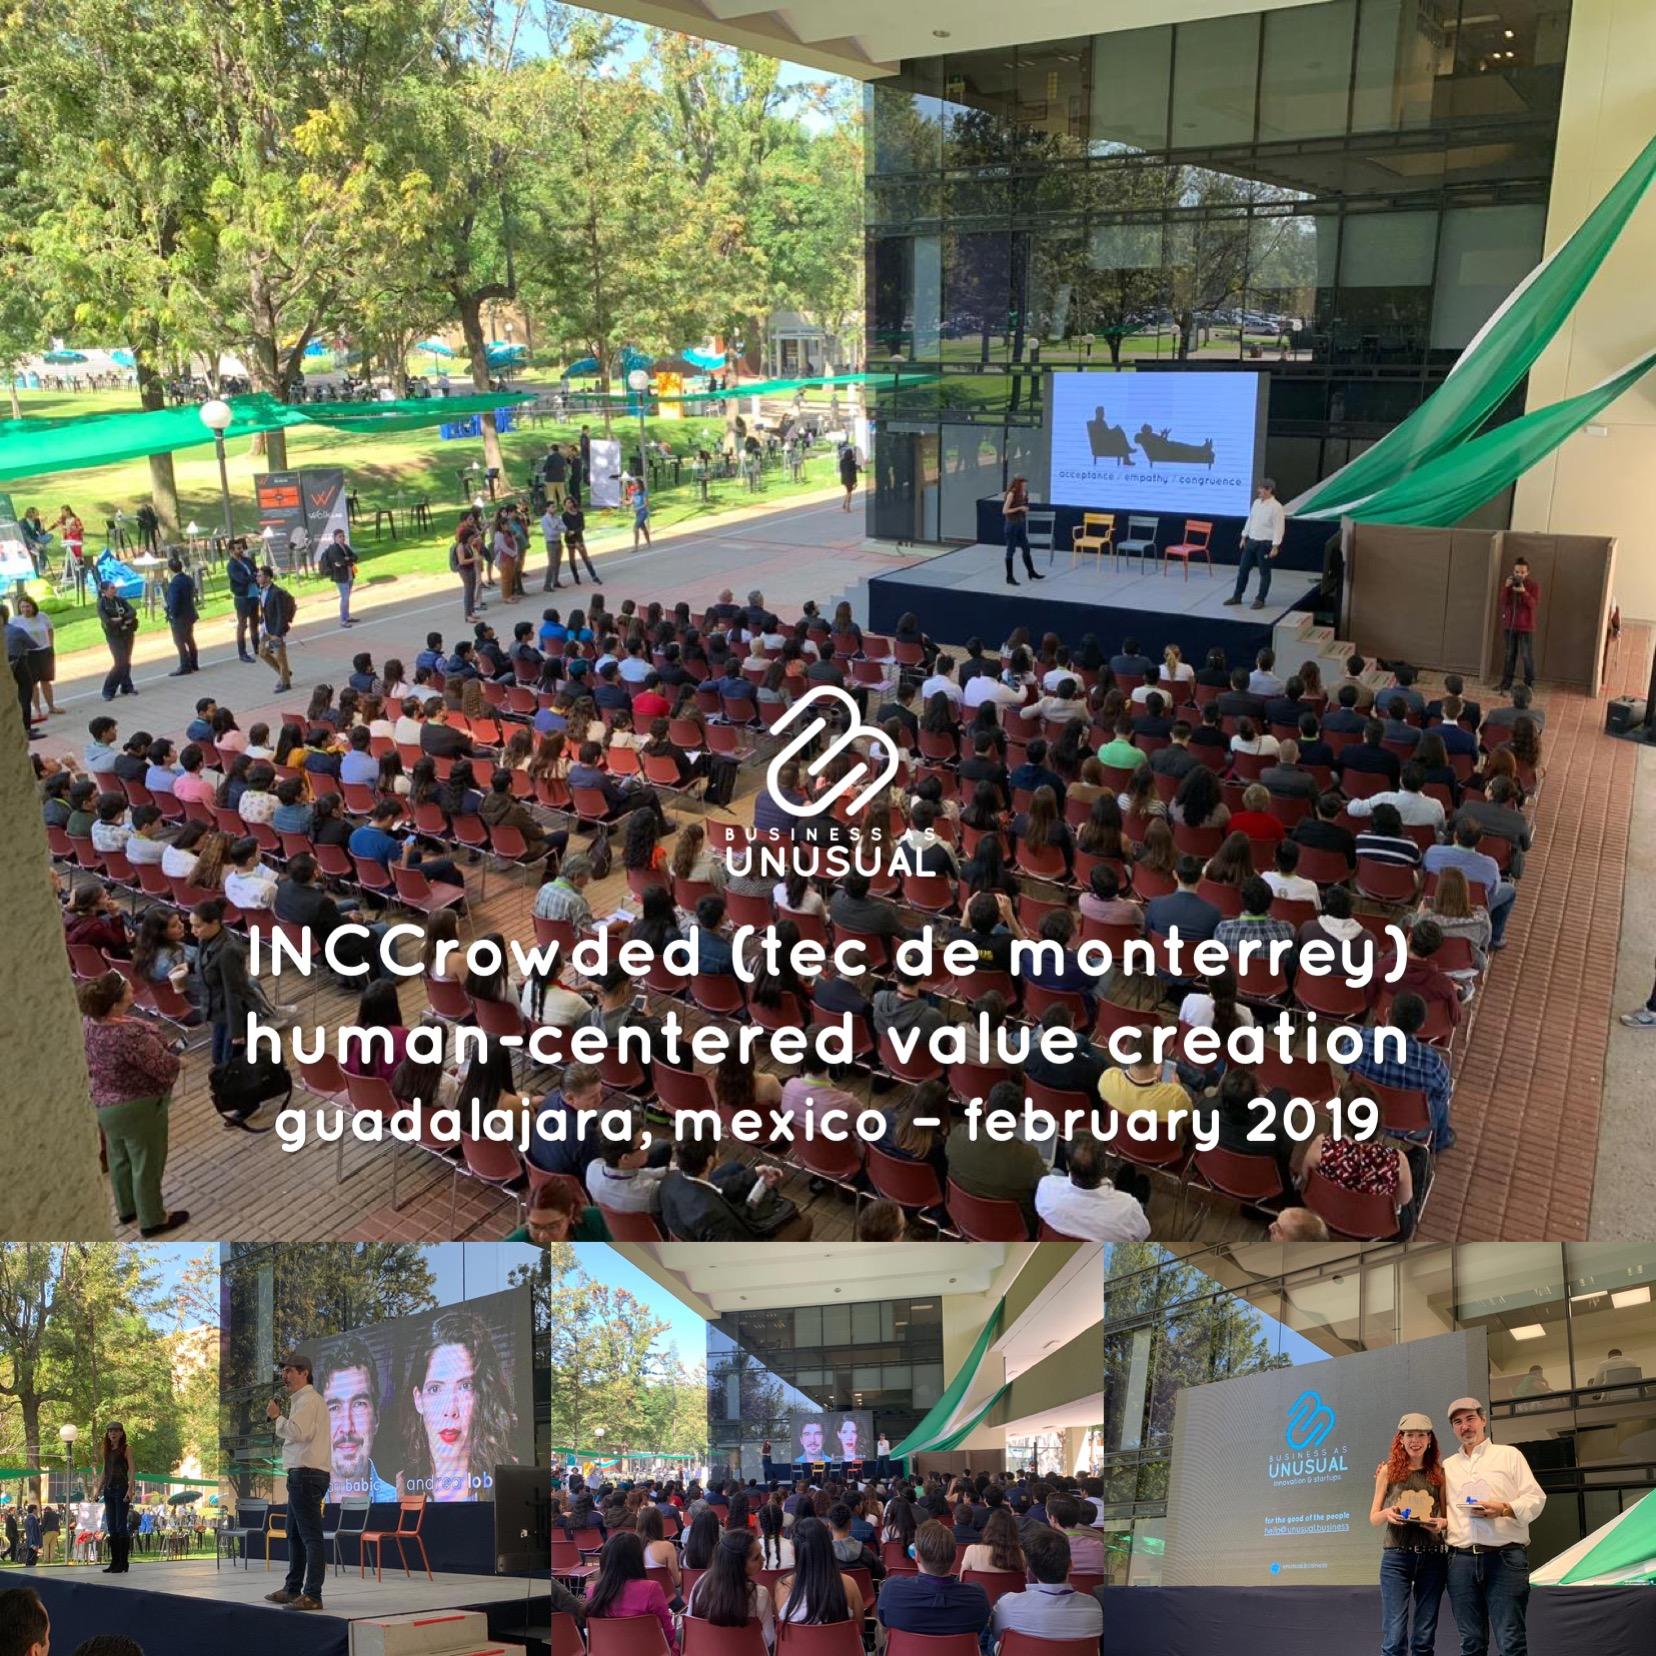 INC Crowded Tecnologico de Monterrey - Human Centered Value Creation - Guadalajara February 2019